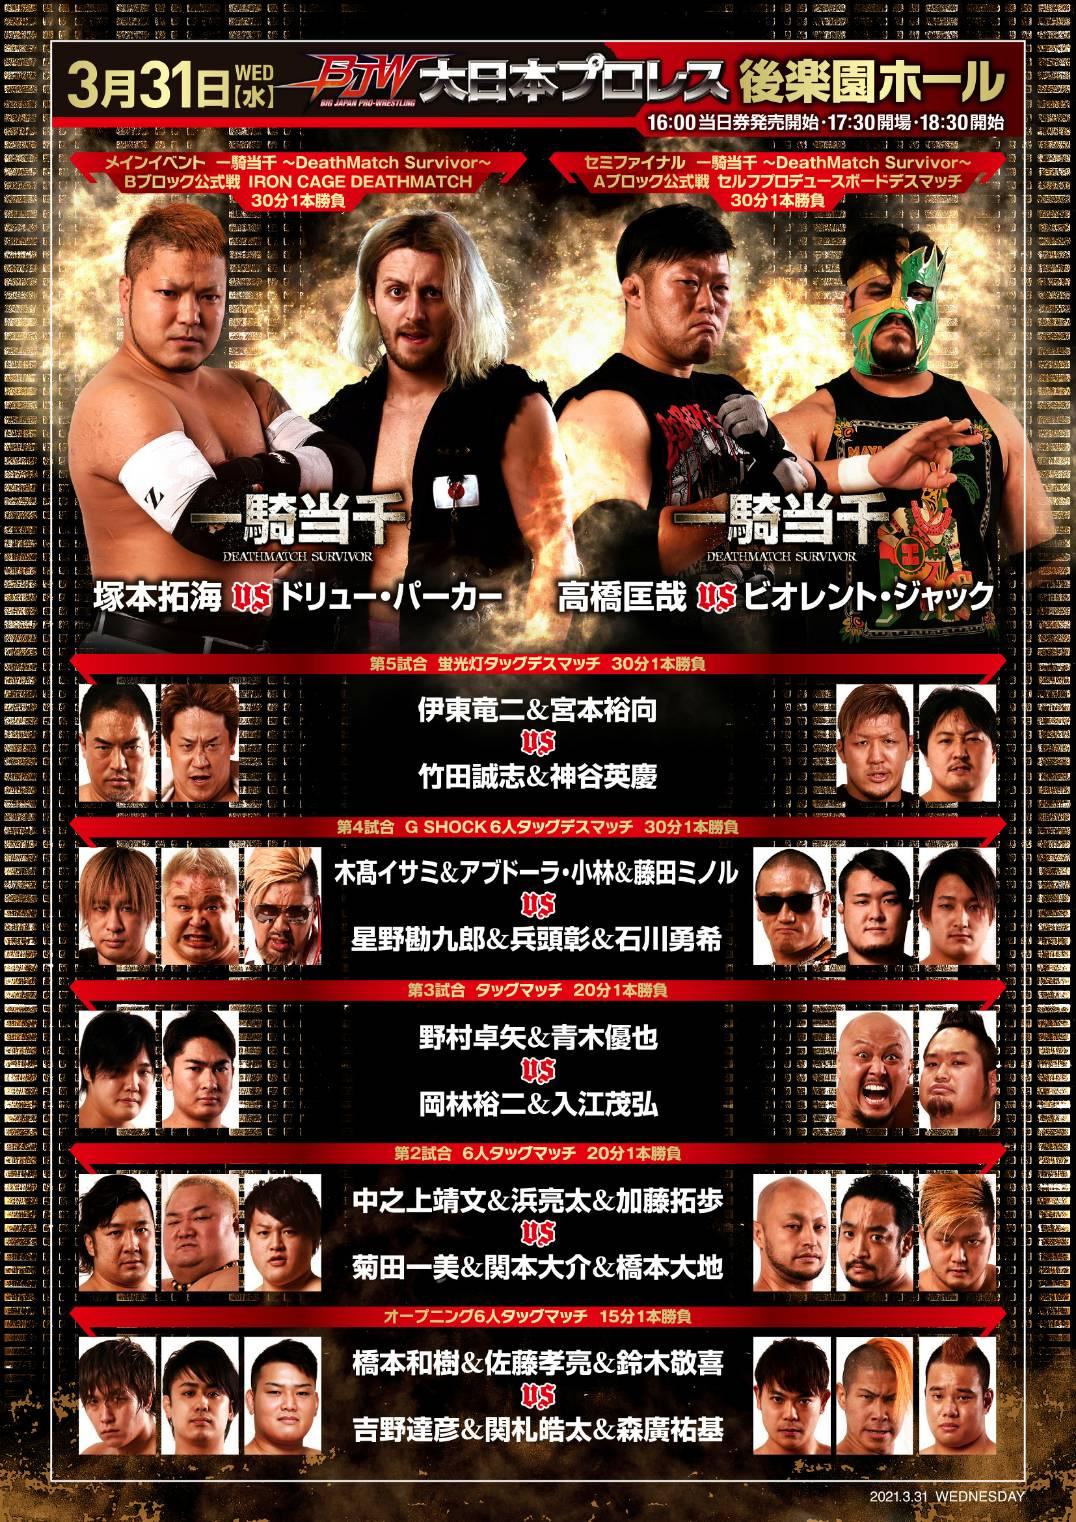 「一騎当千DeathMatch Survivor~公式戦」東京・後楽園ホール大会